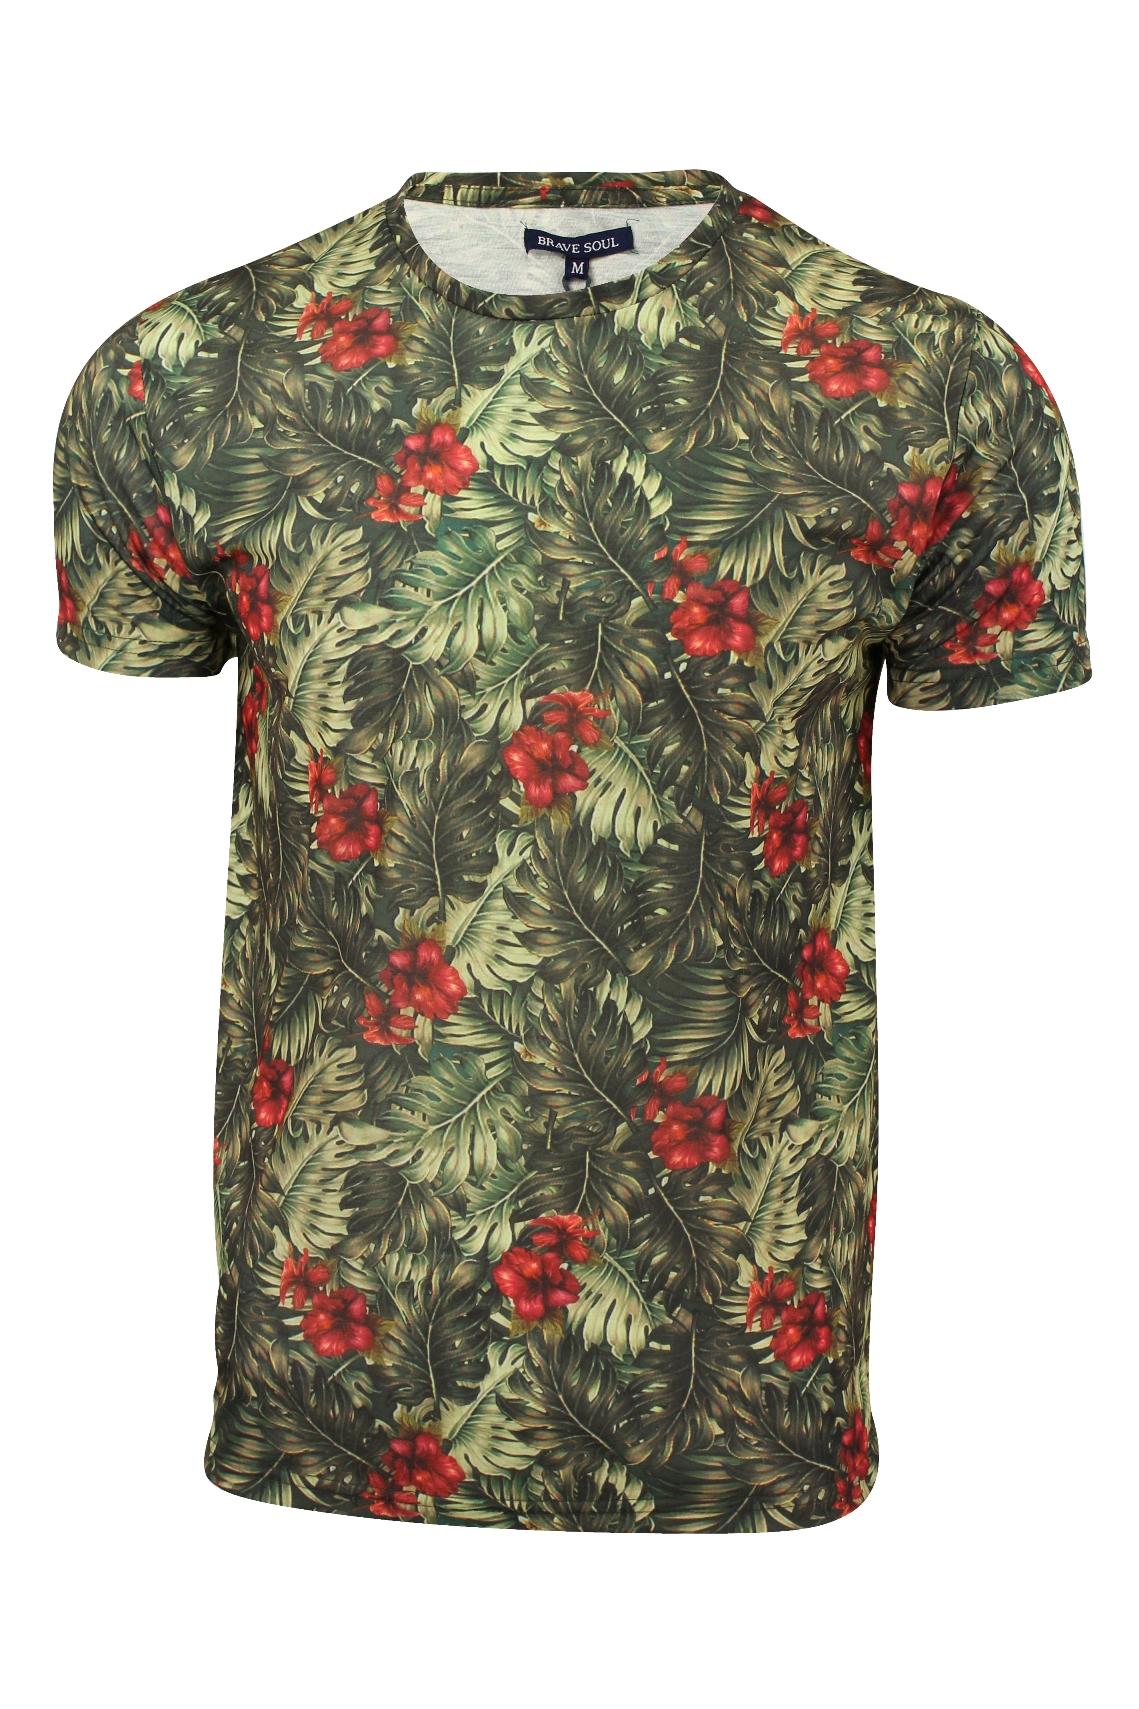 Mens T Shirt Hawaiian Print By Brave Soul 39 Palm 39 Short